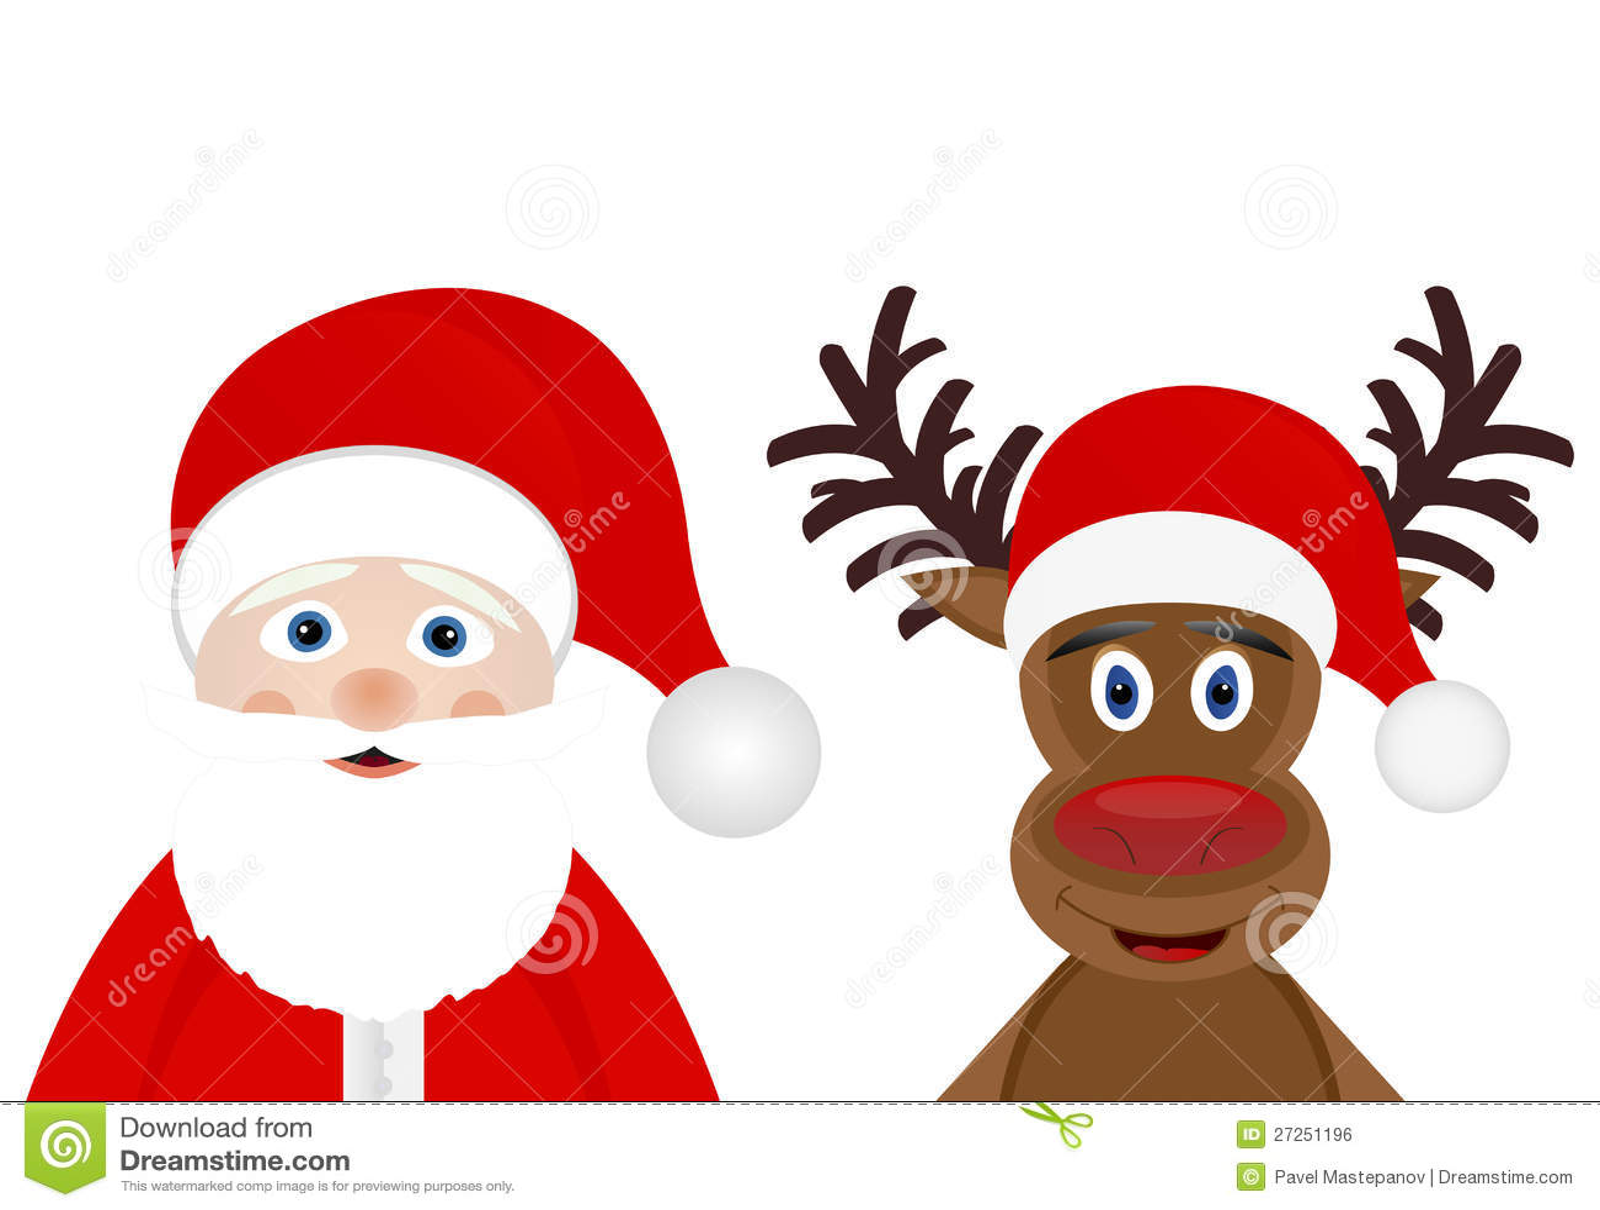 Santa claus and christmas deer royalty free stock image image